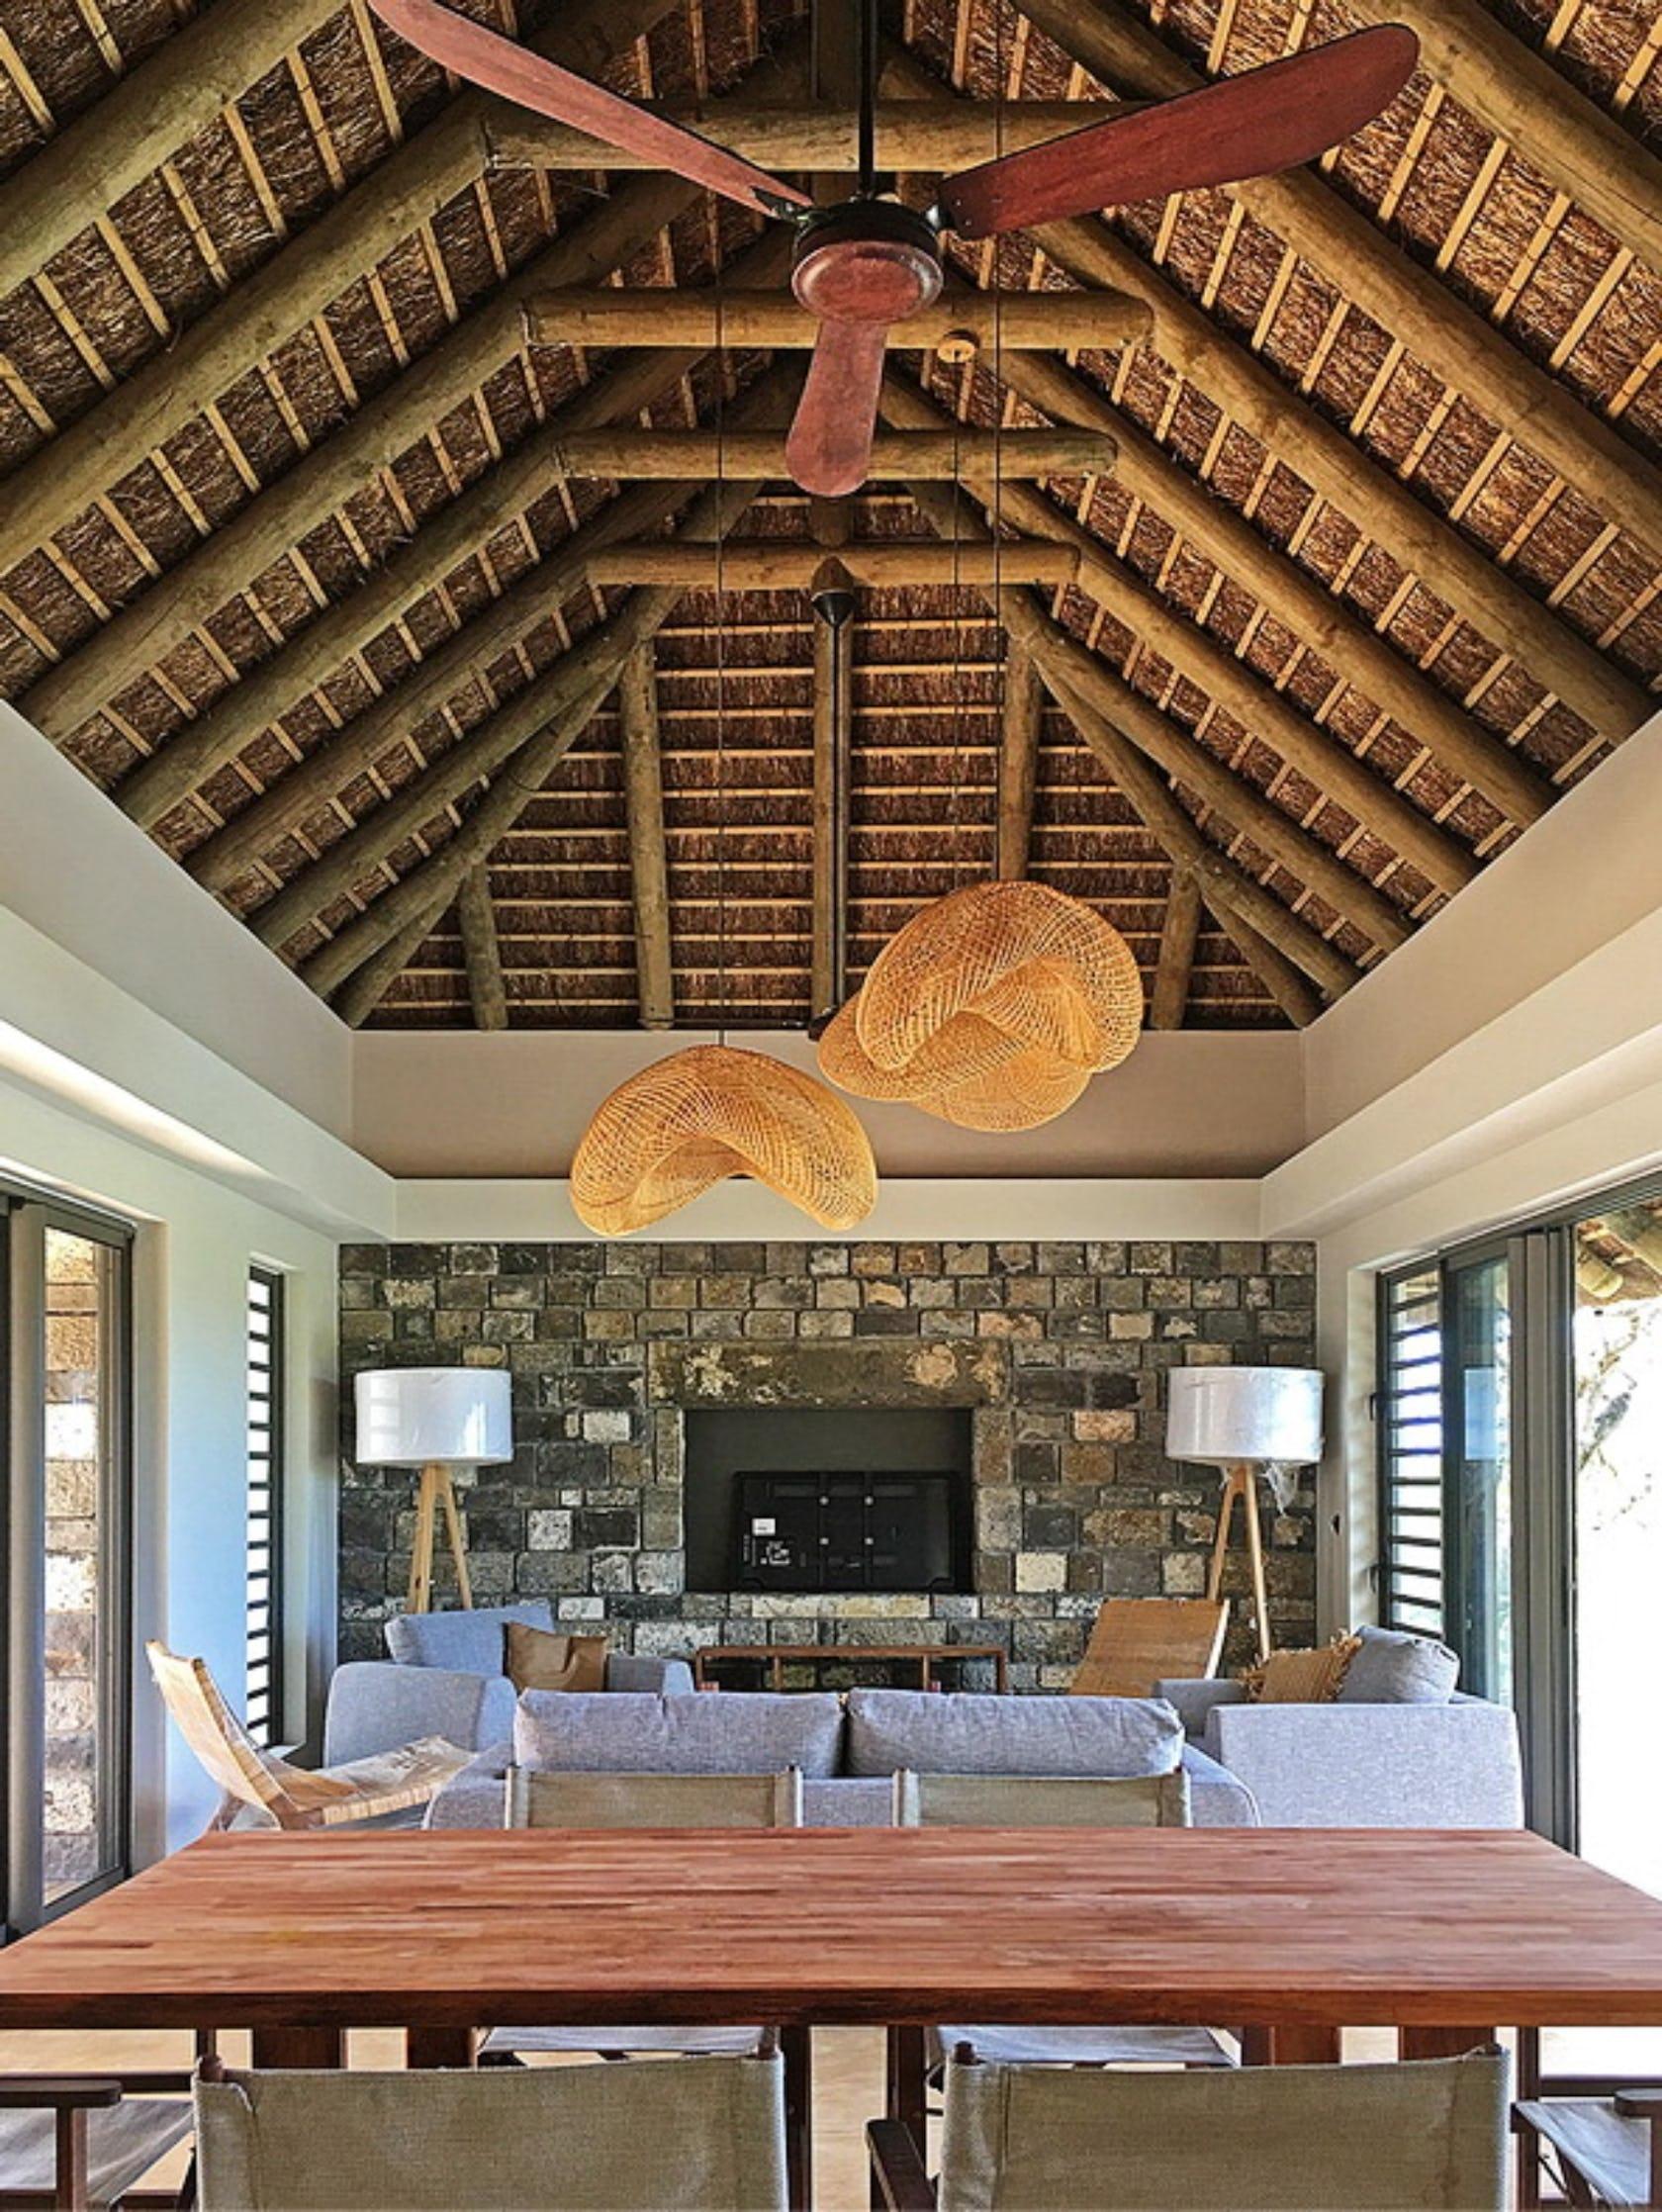 wood flooring indoors hardwood living room room housing building interior design furniture